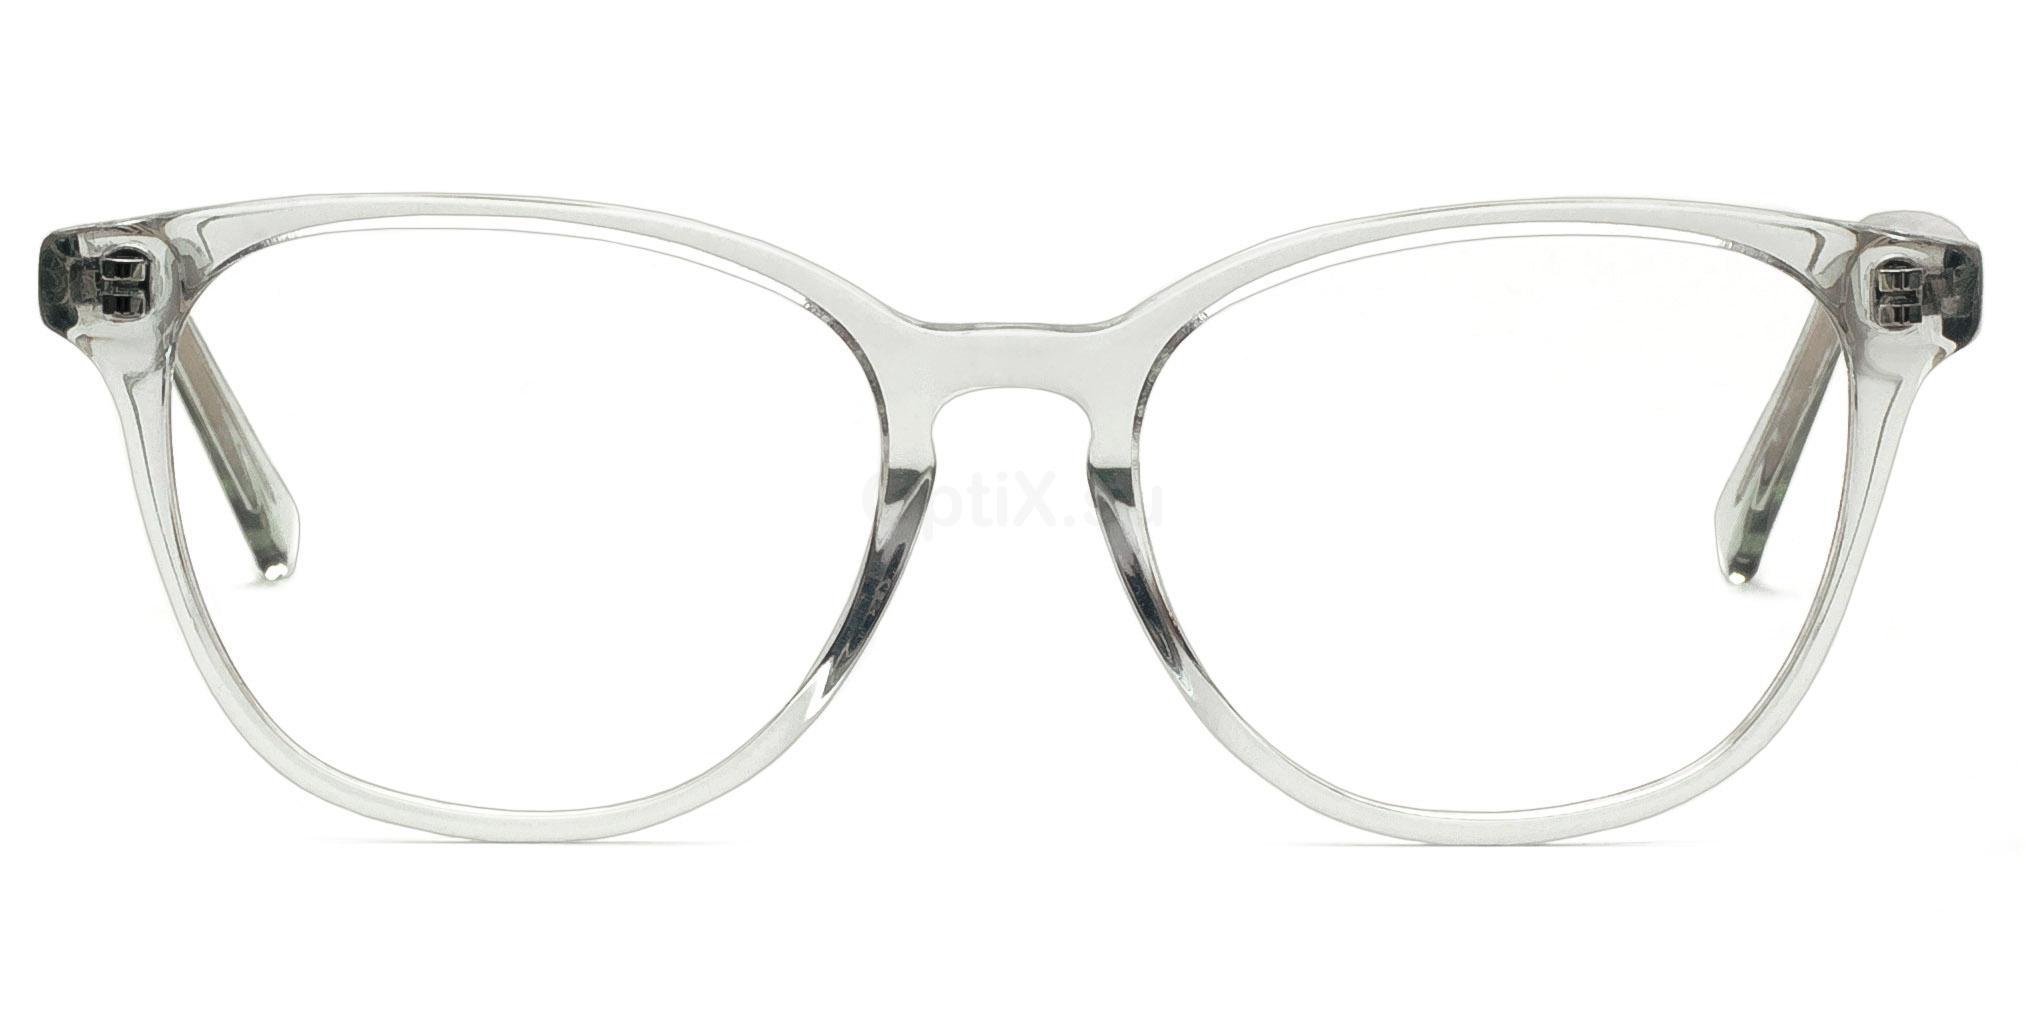 C1 BOA1008 Glasses, Infinity